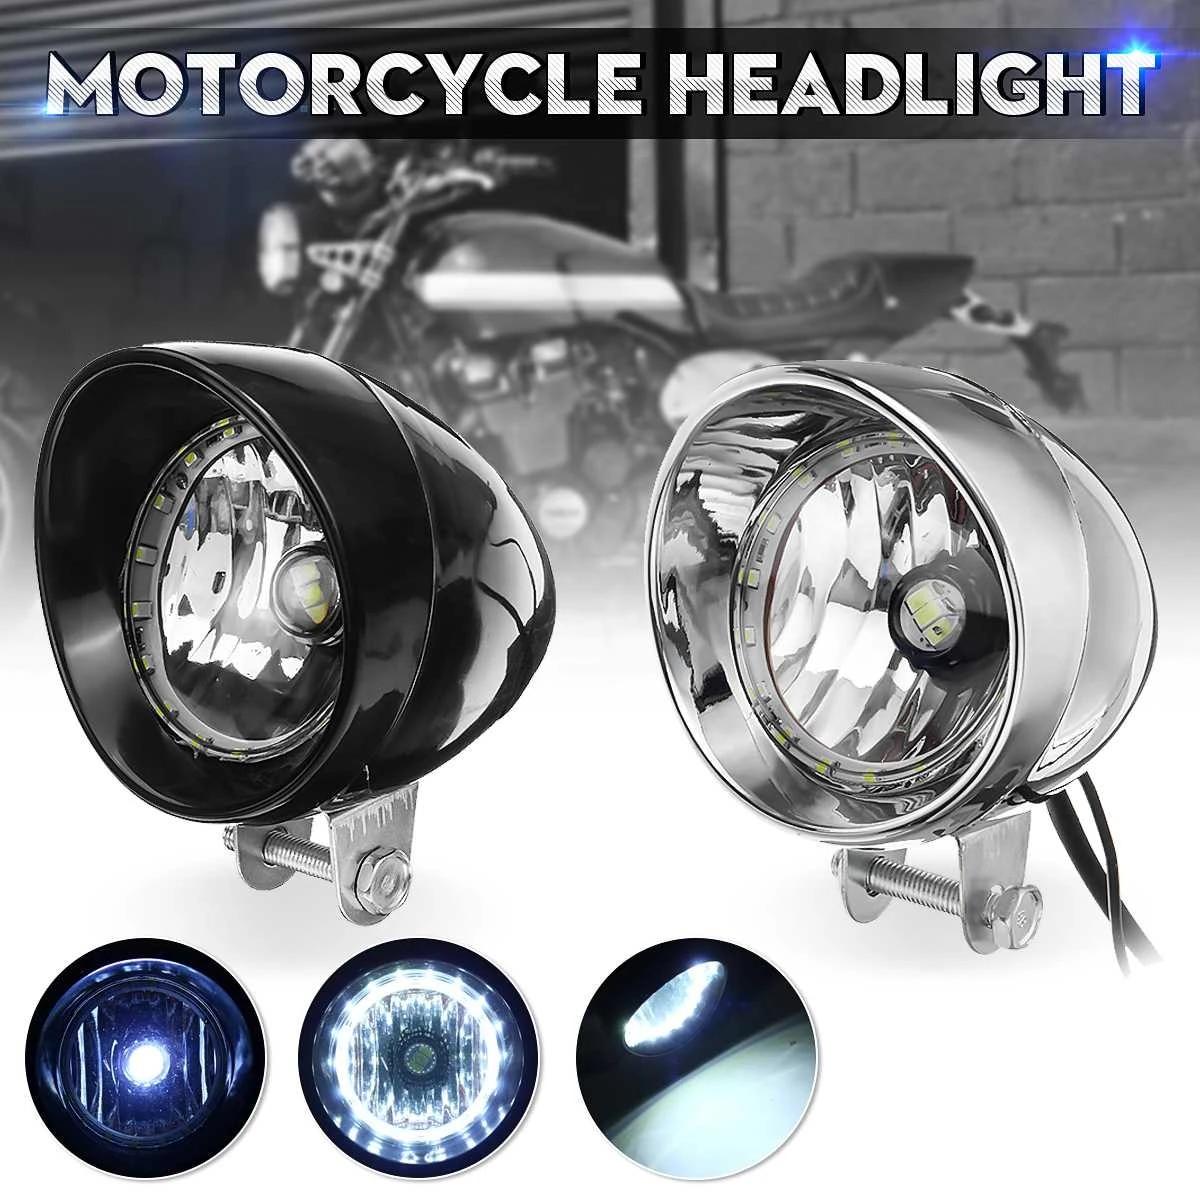 Black Chrome Led Motorcycle Universal Bullet Headlights High Low Beam Head Light Lamp Aliexpress